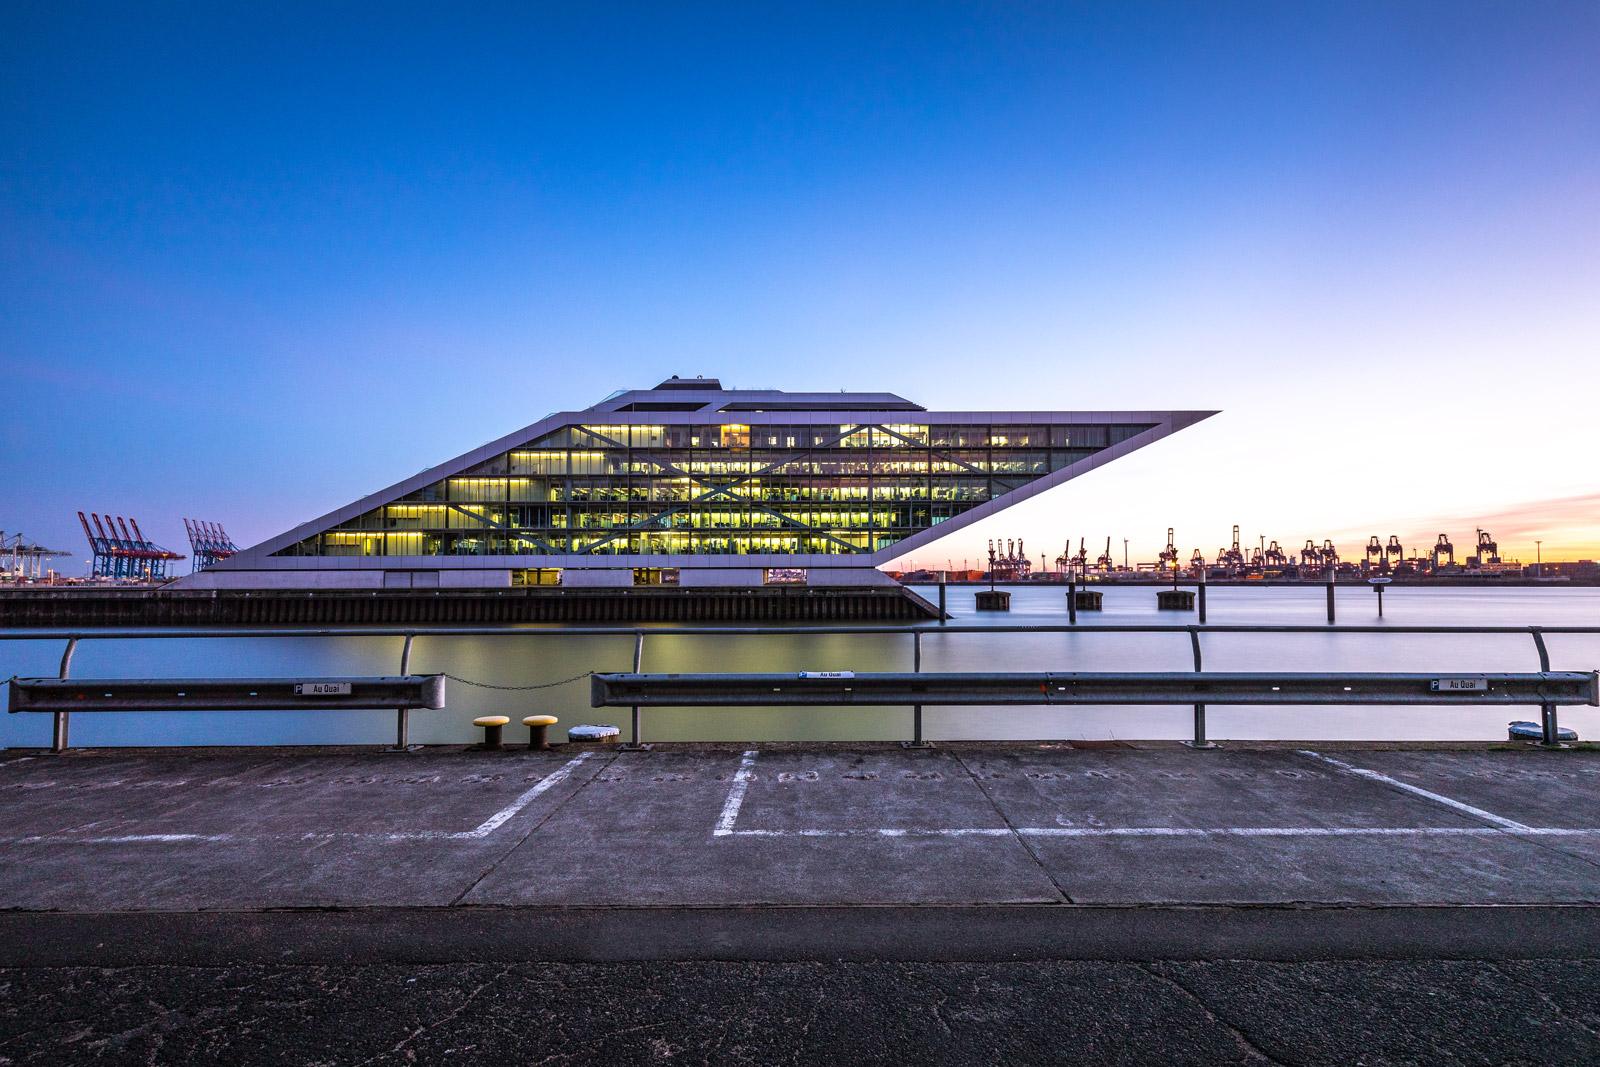 Dockland Bürogeböude im Hamburger Hafen